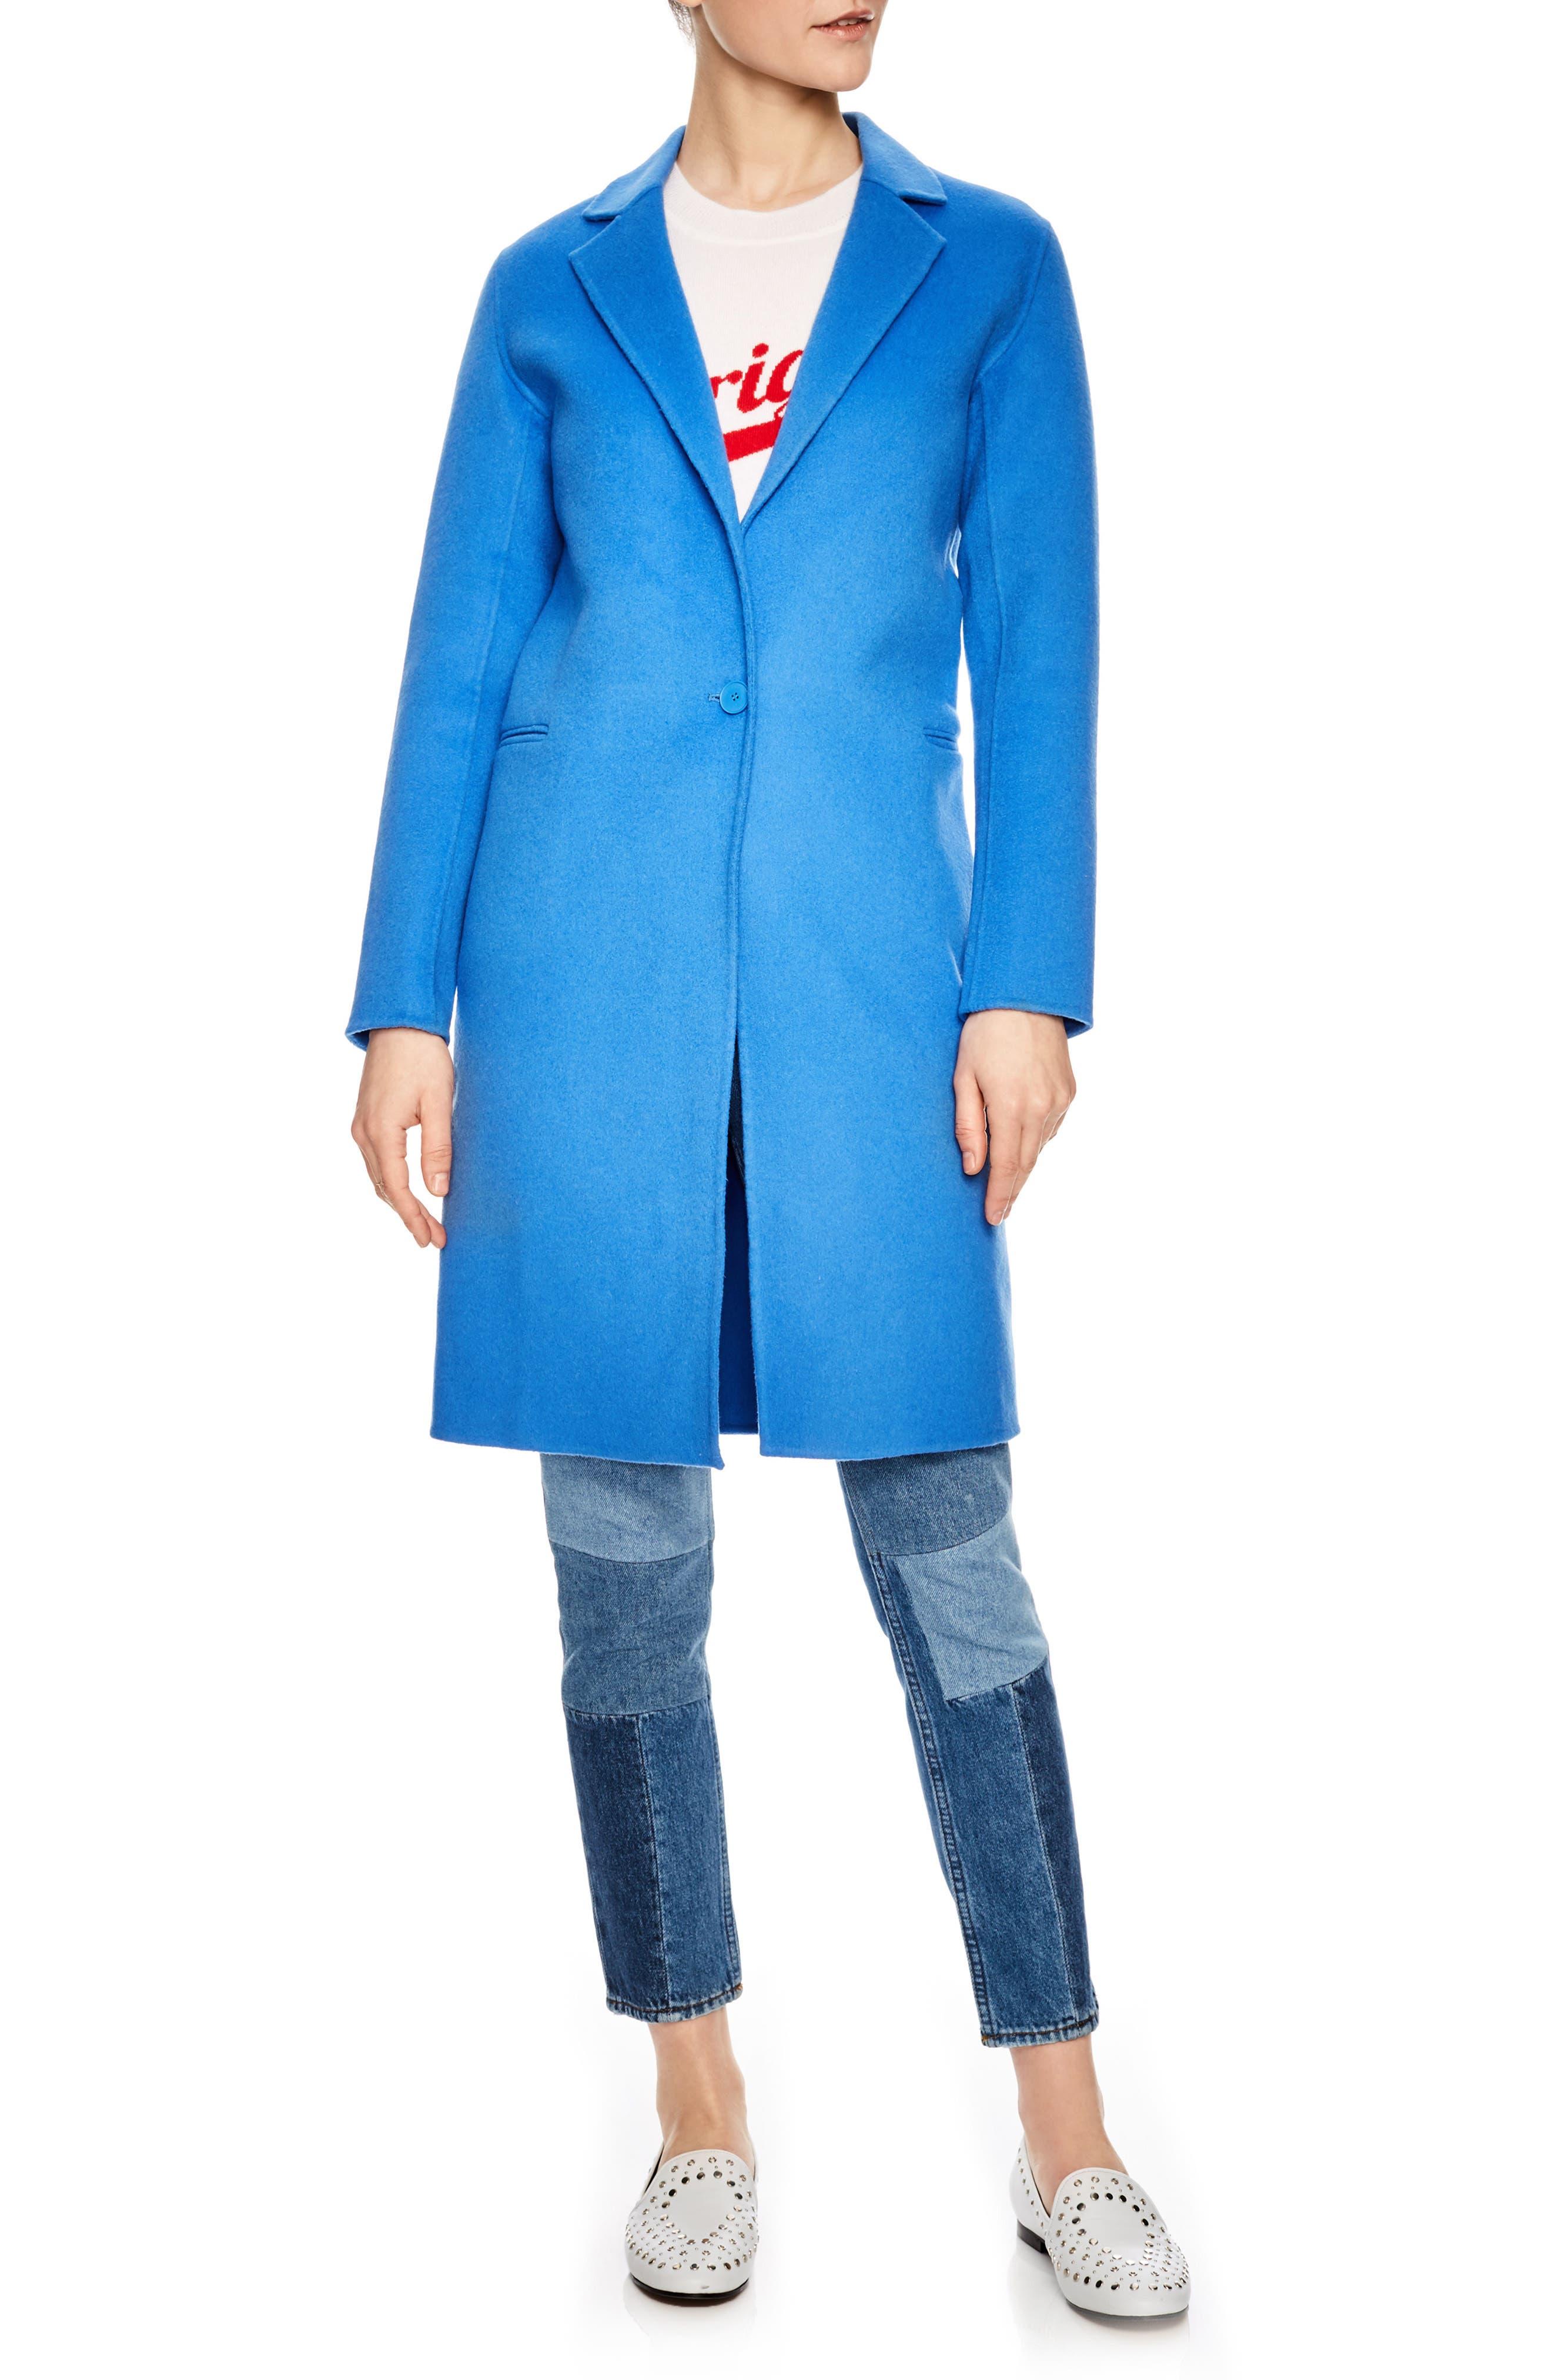 sandro Bleu Cerulean Wool Walking Coat